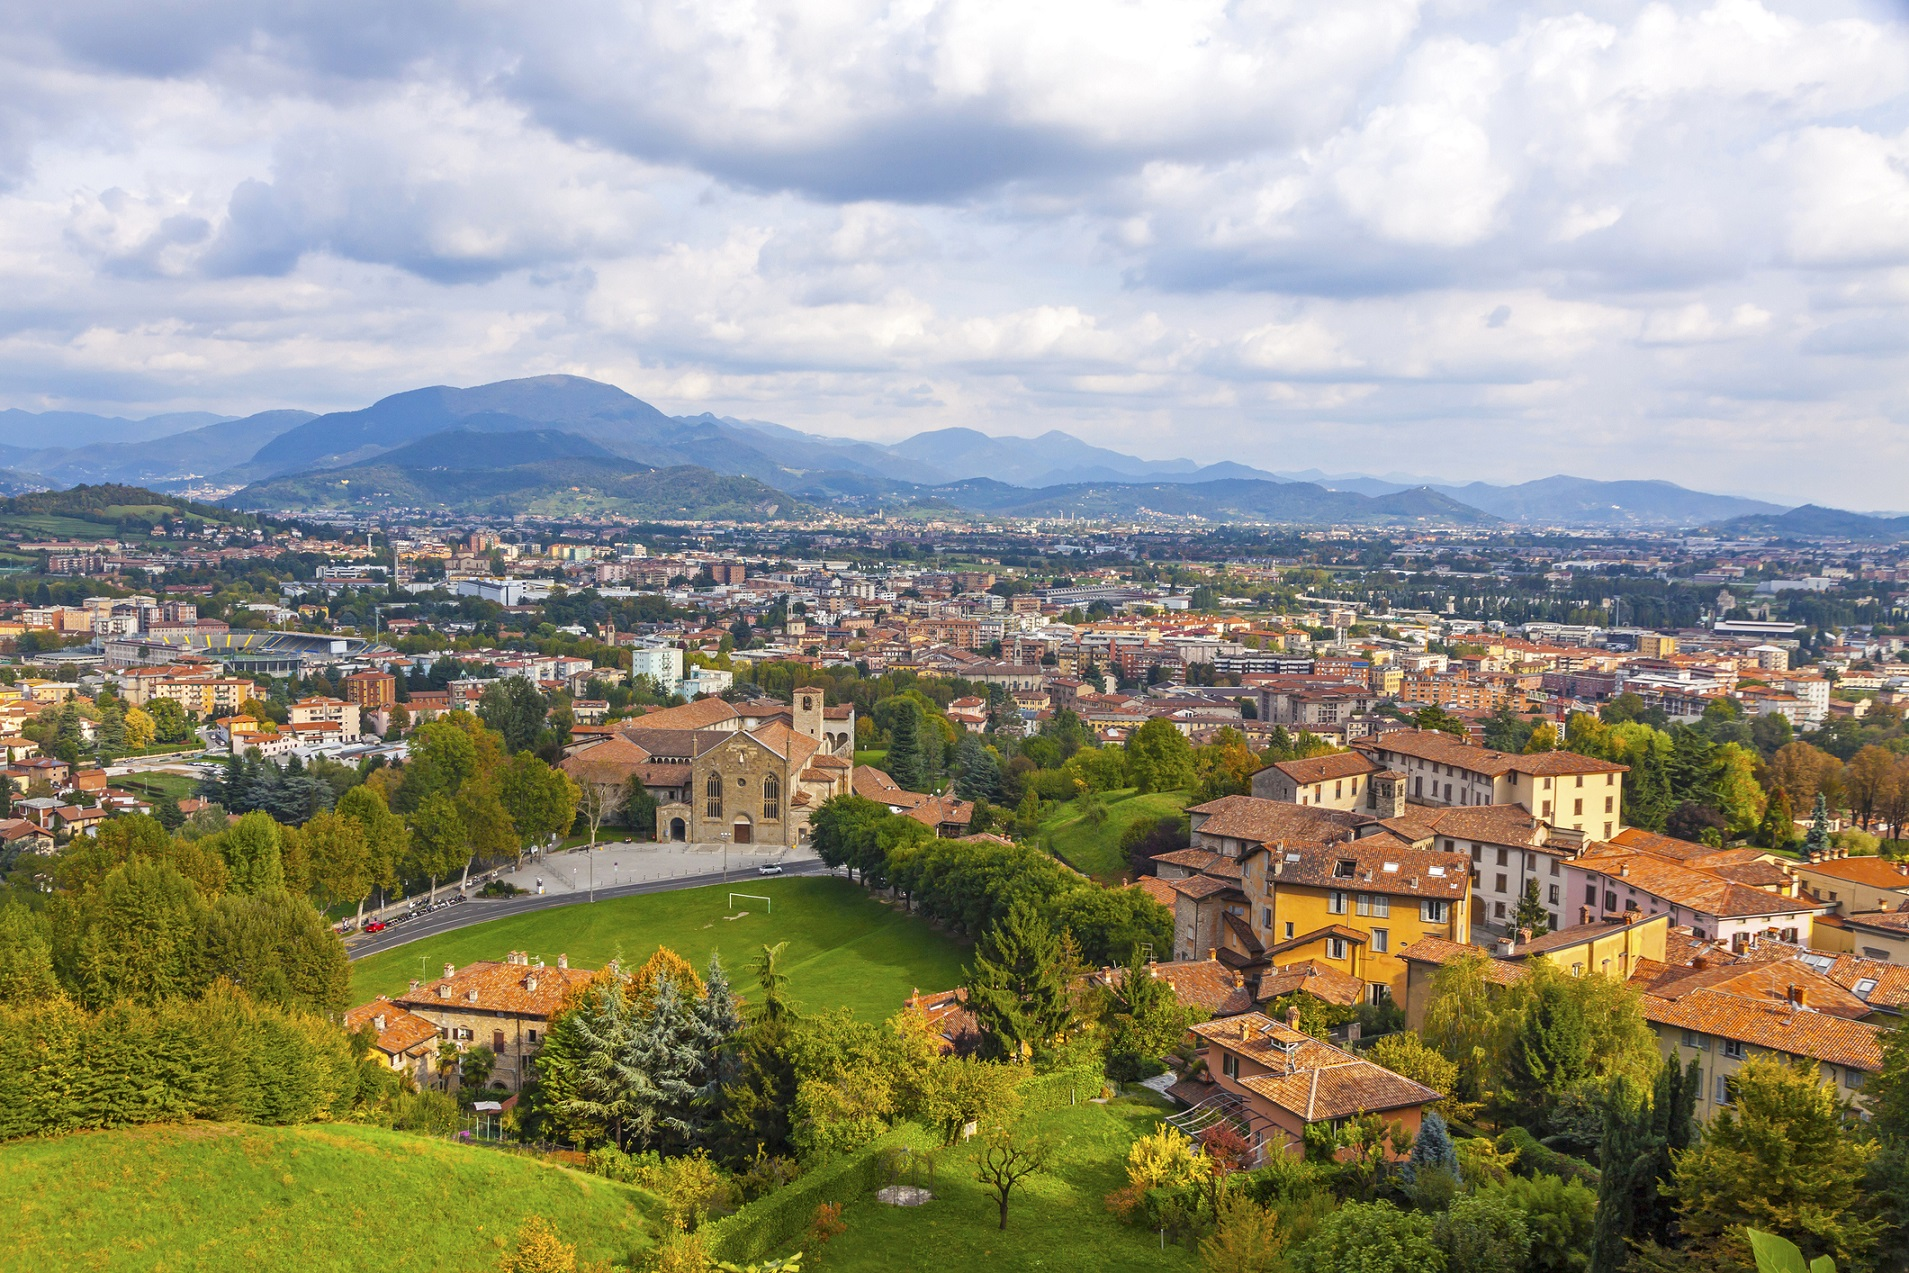 Boccaleone e CAPACITyES, quartieri protagonisti